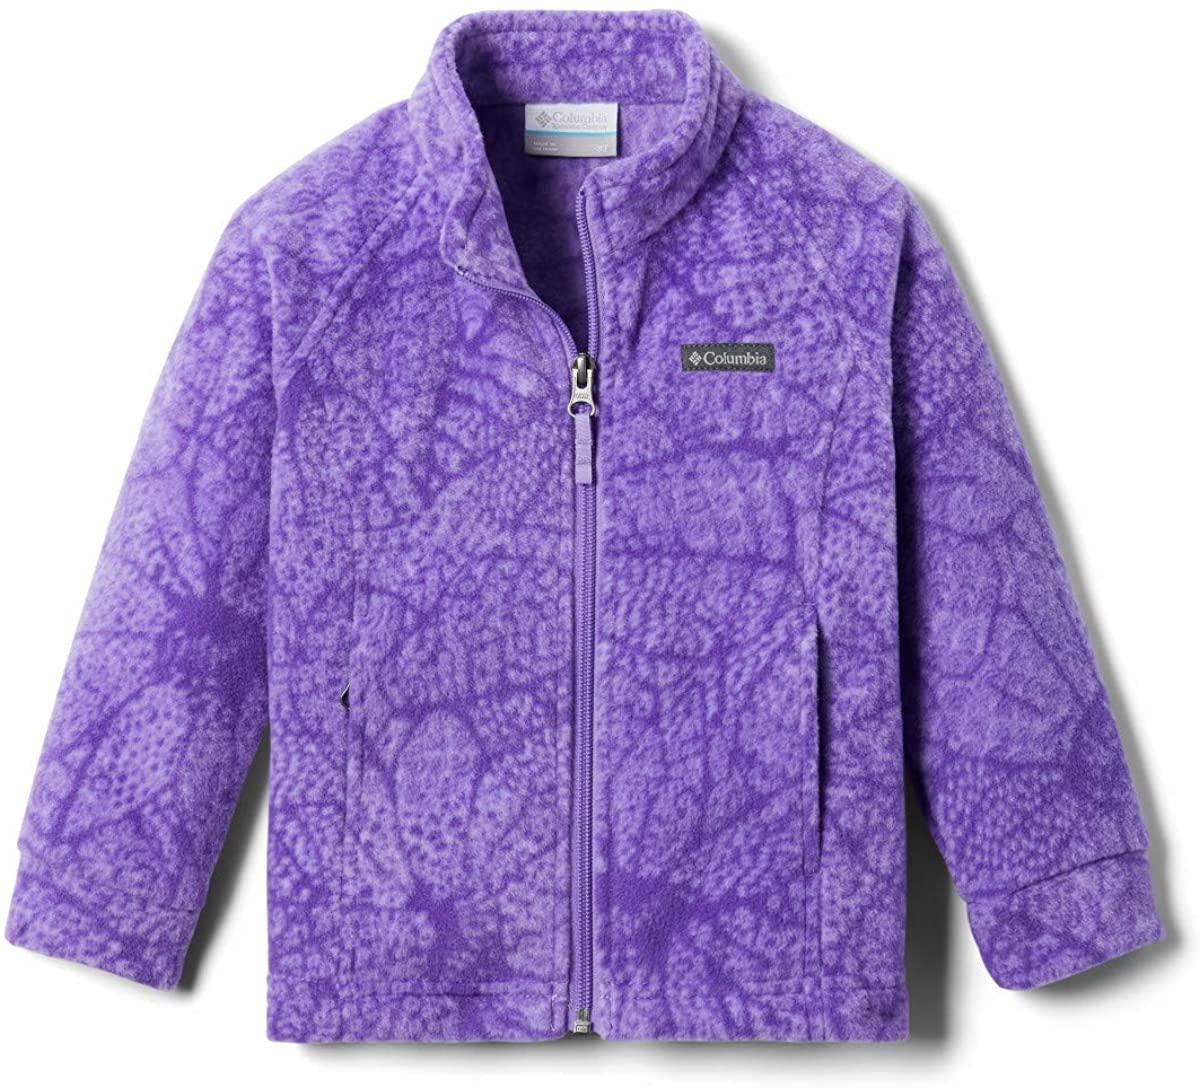 Columbia Baby Benton Springs II Printed Fleece, paisley purple flowers, 3/6